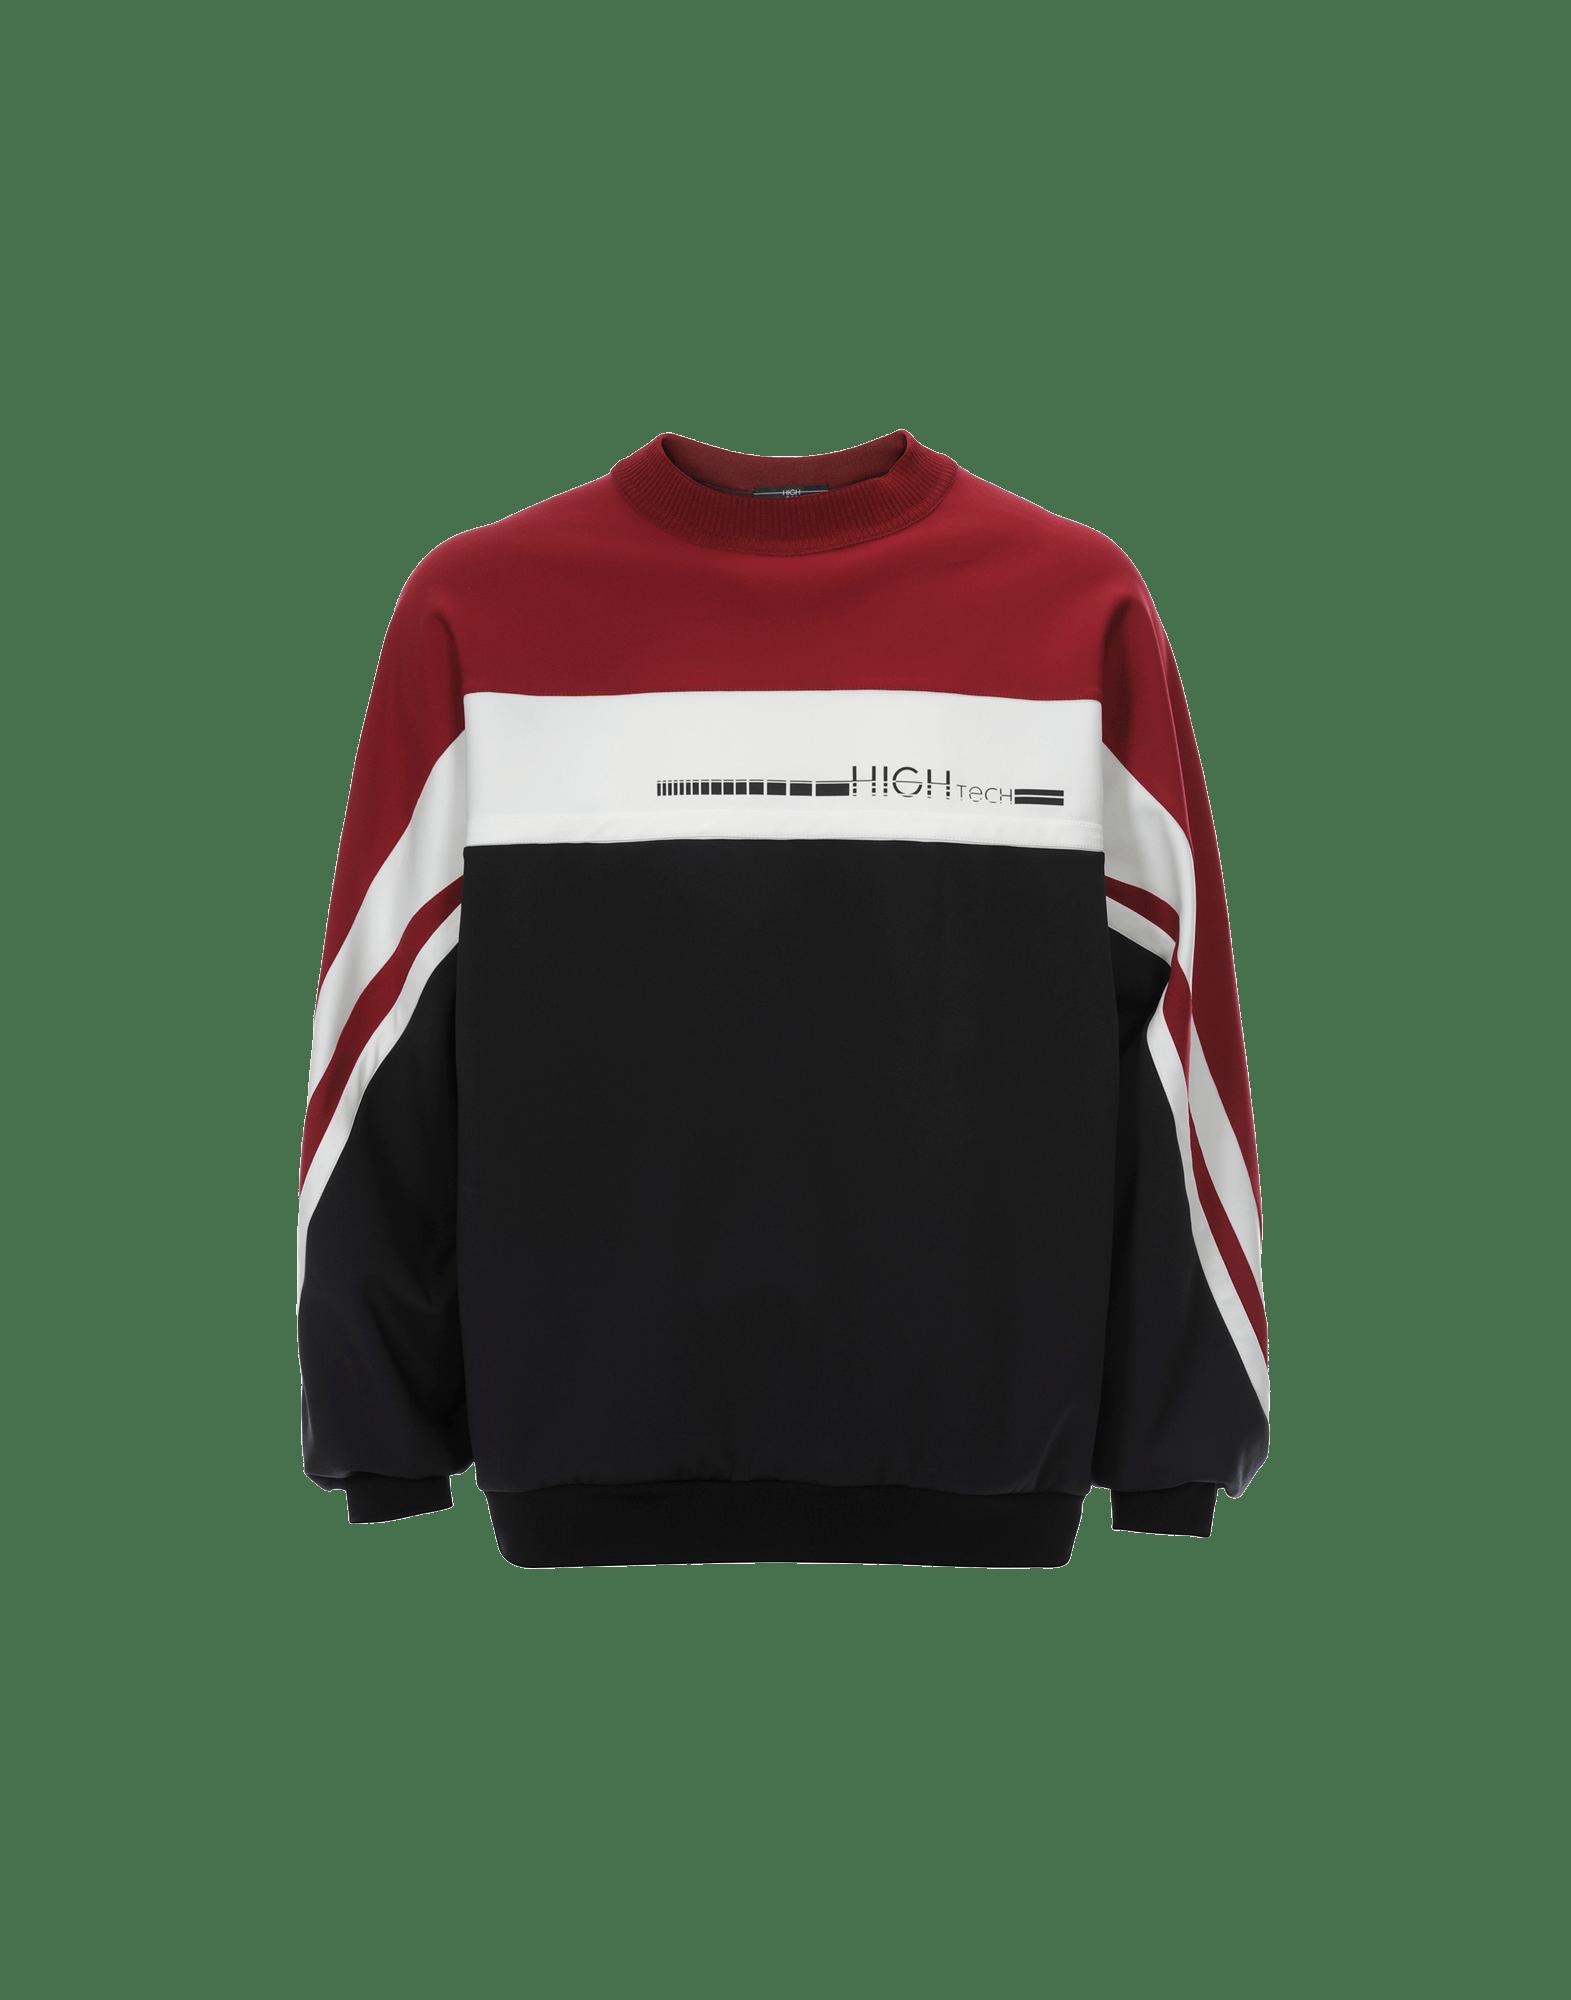 Bandes TateSweat Des Horizontales Shirt Avec tQrCsdh